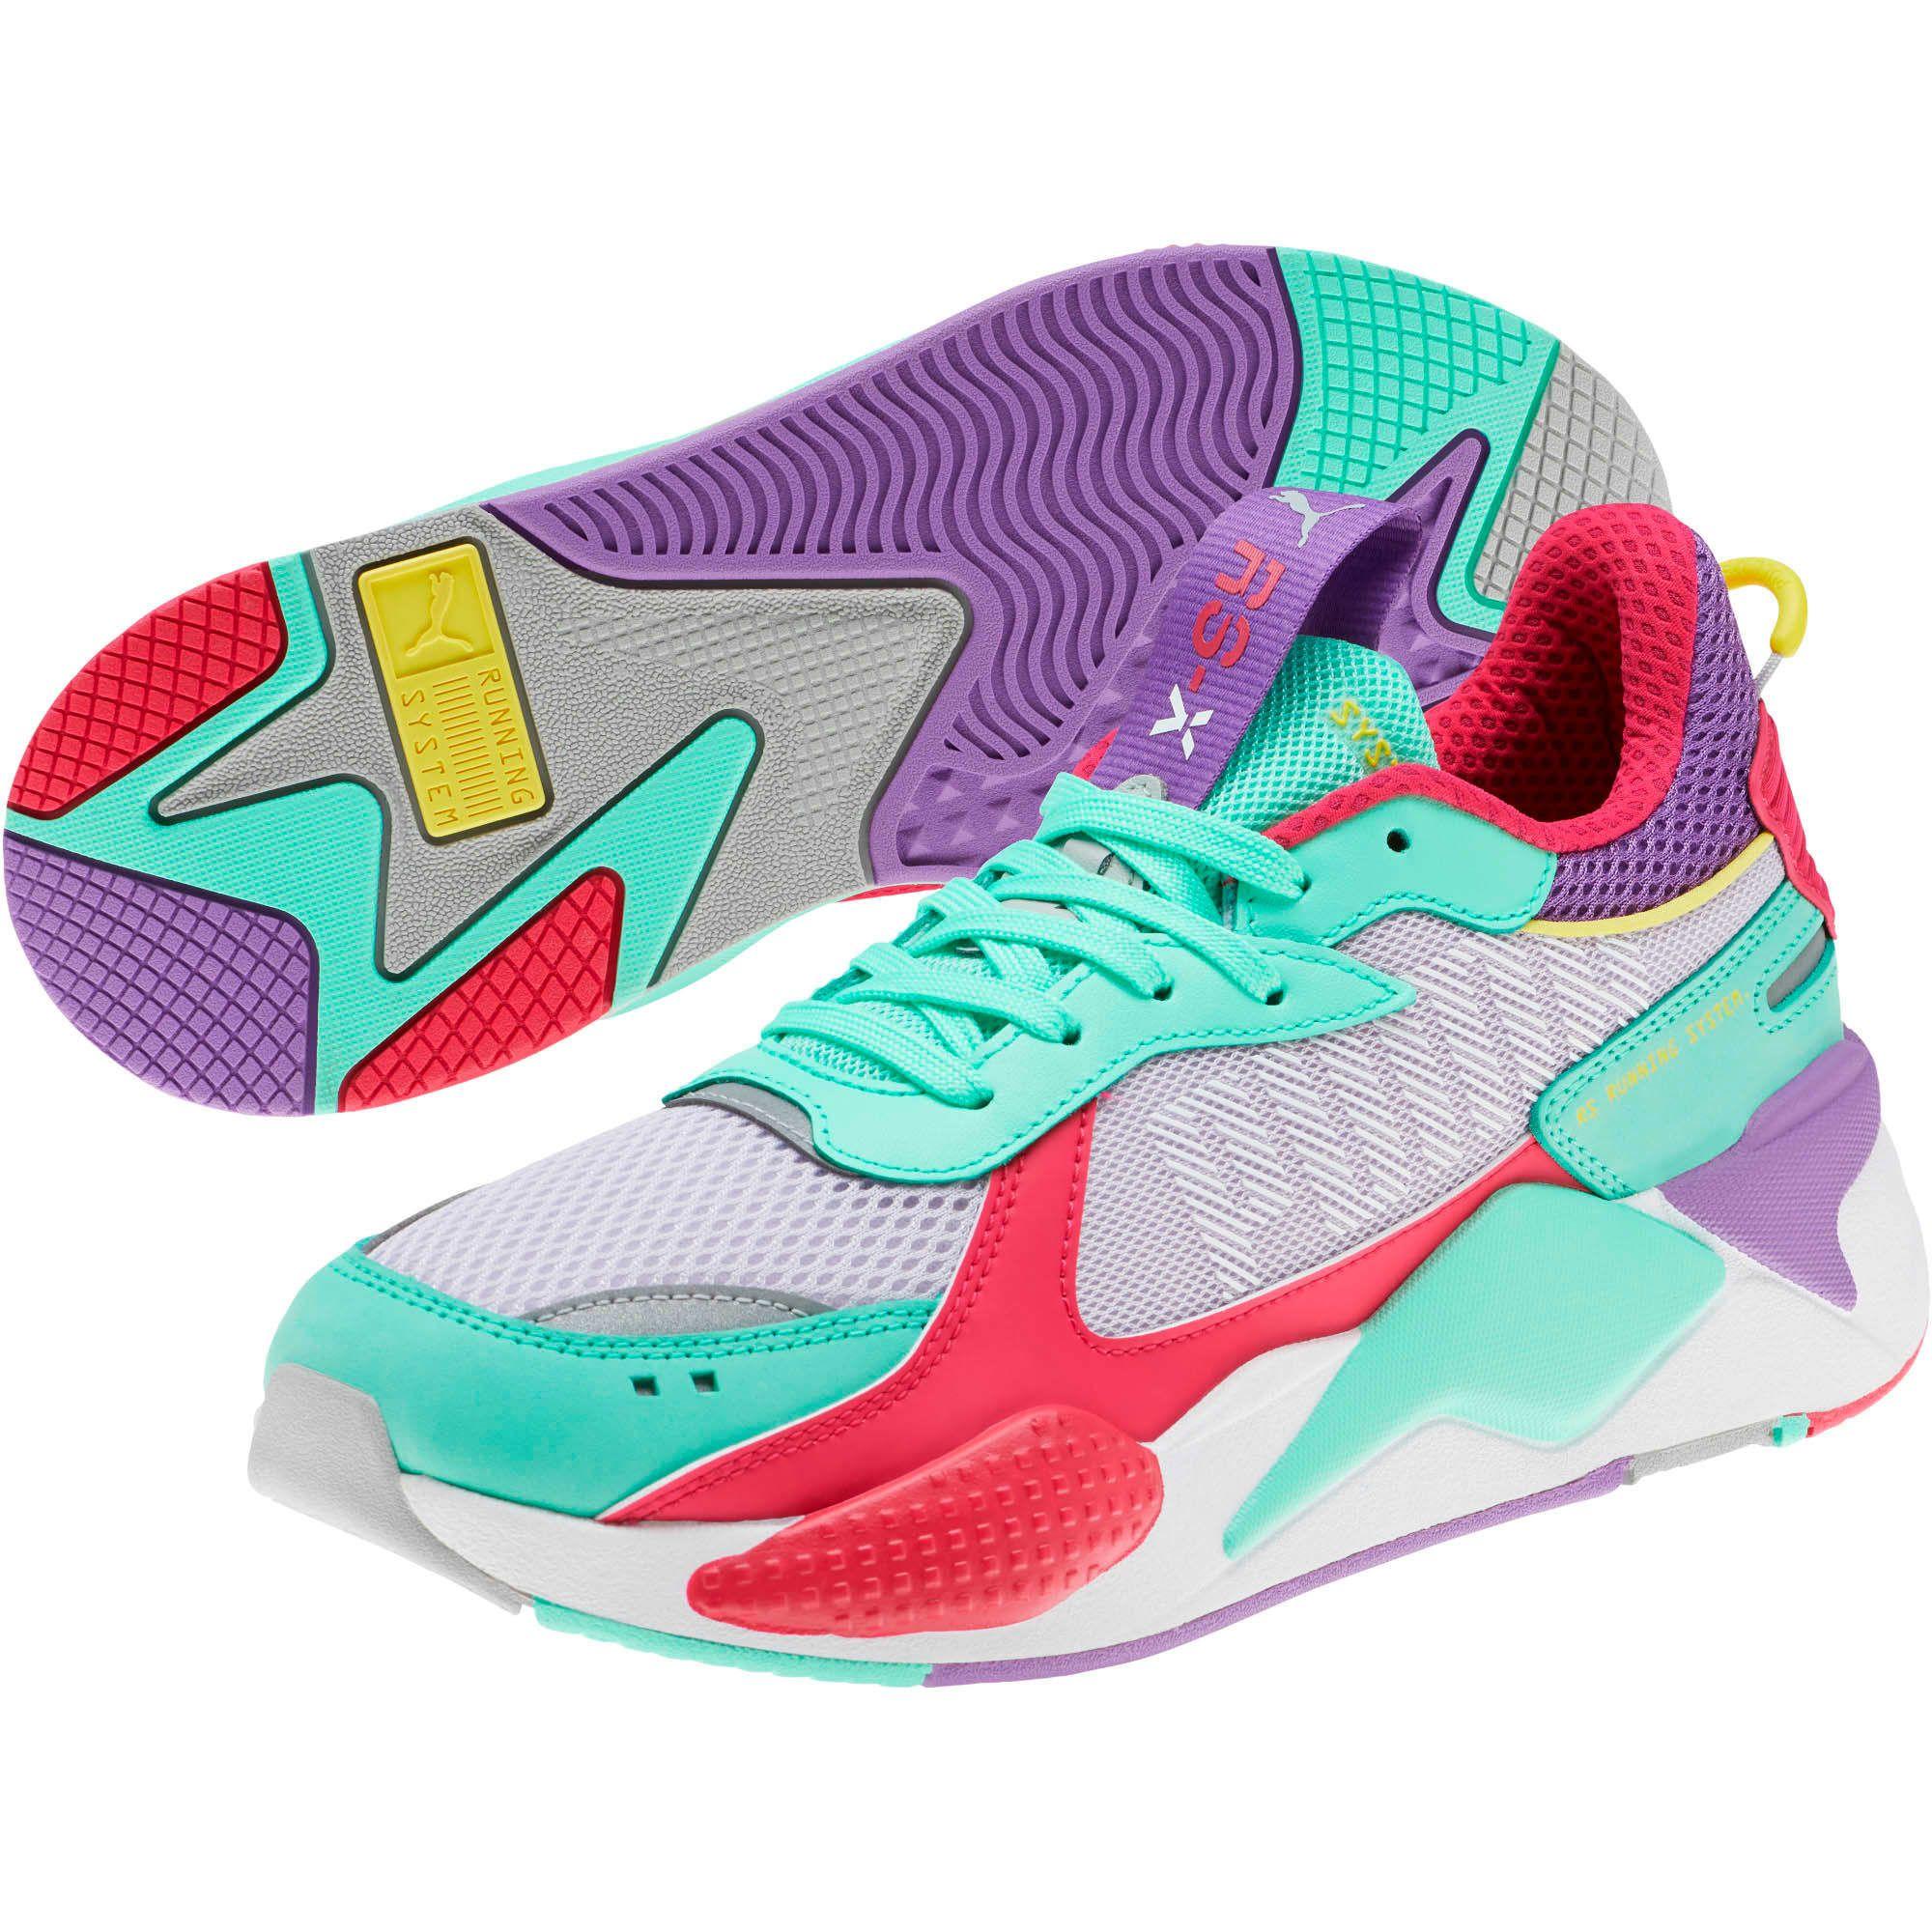 Puma Suede Classic Eco Retro Sneaker Trainers